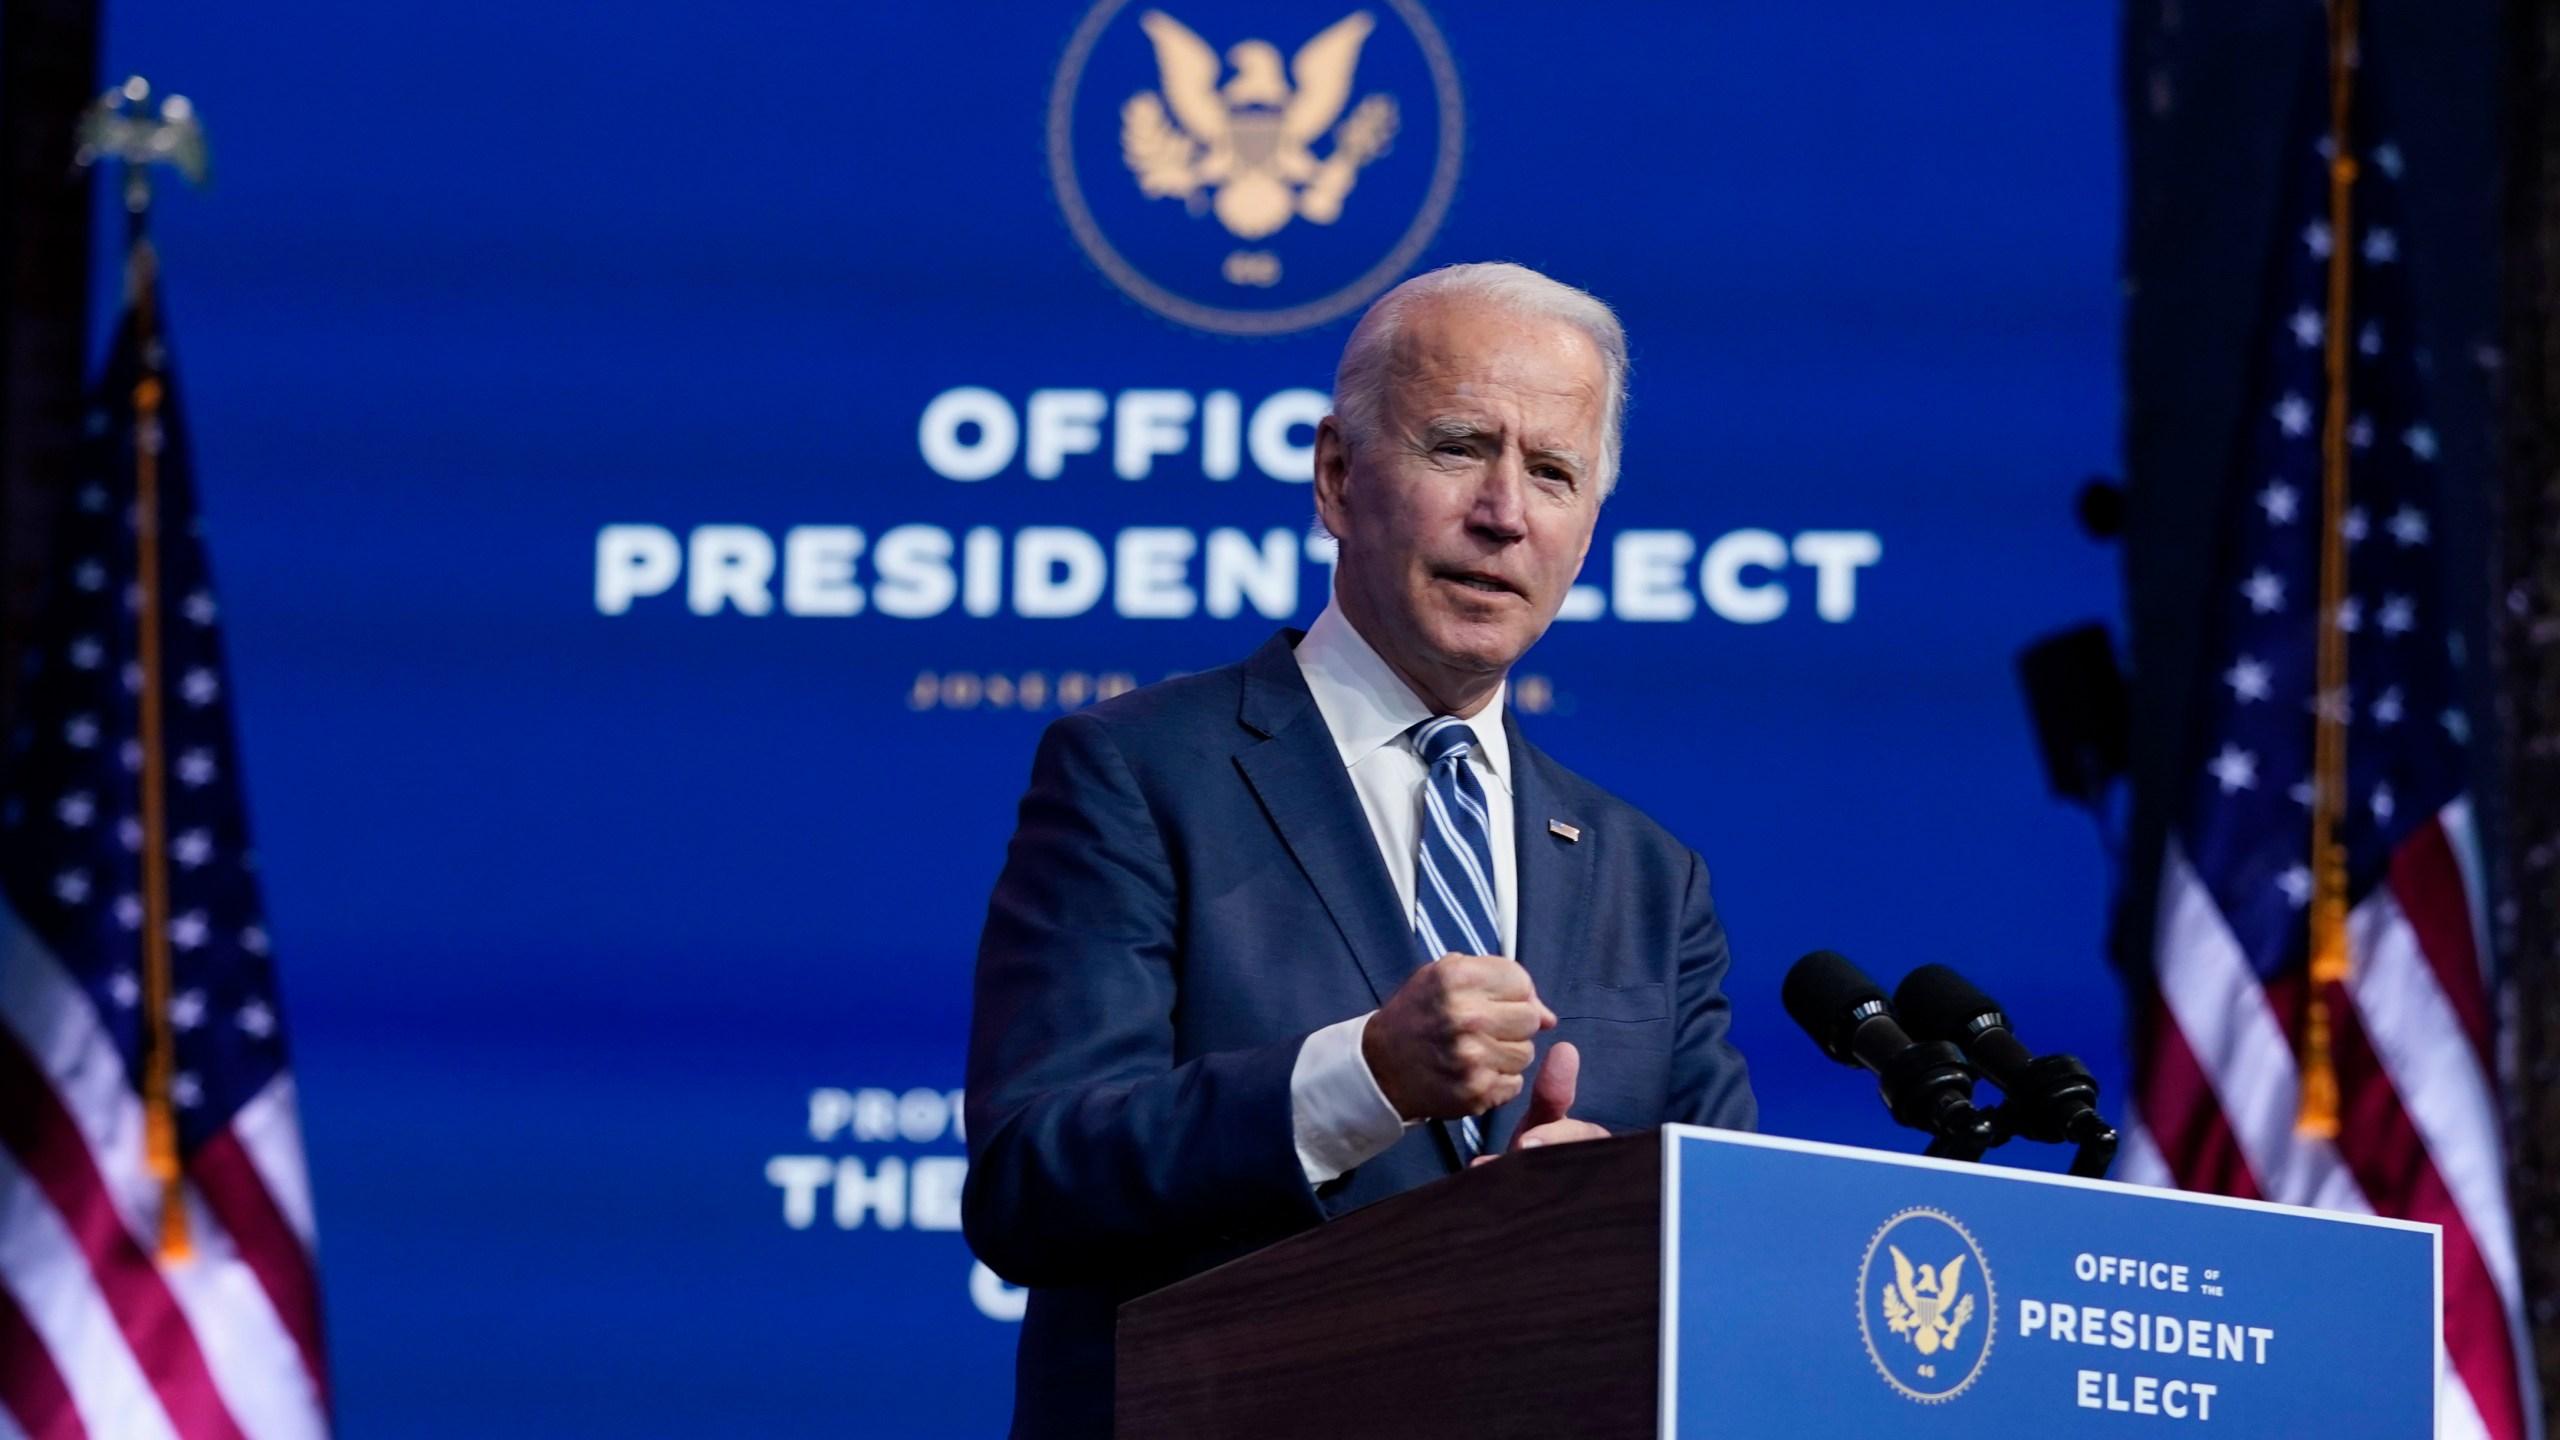 Progressives look to make early mark on Biden White House – WBOY.com